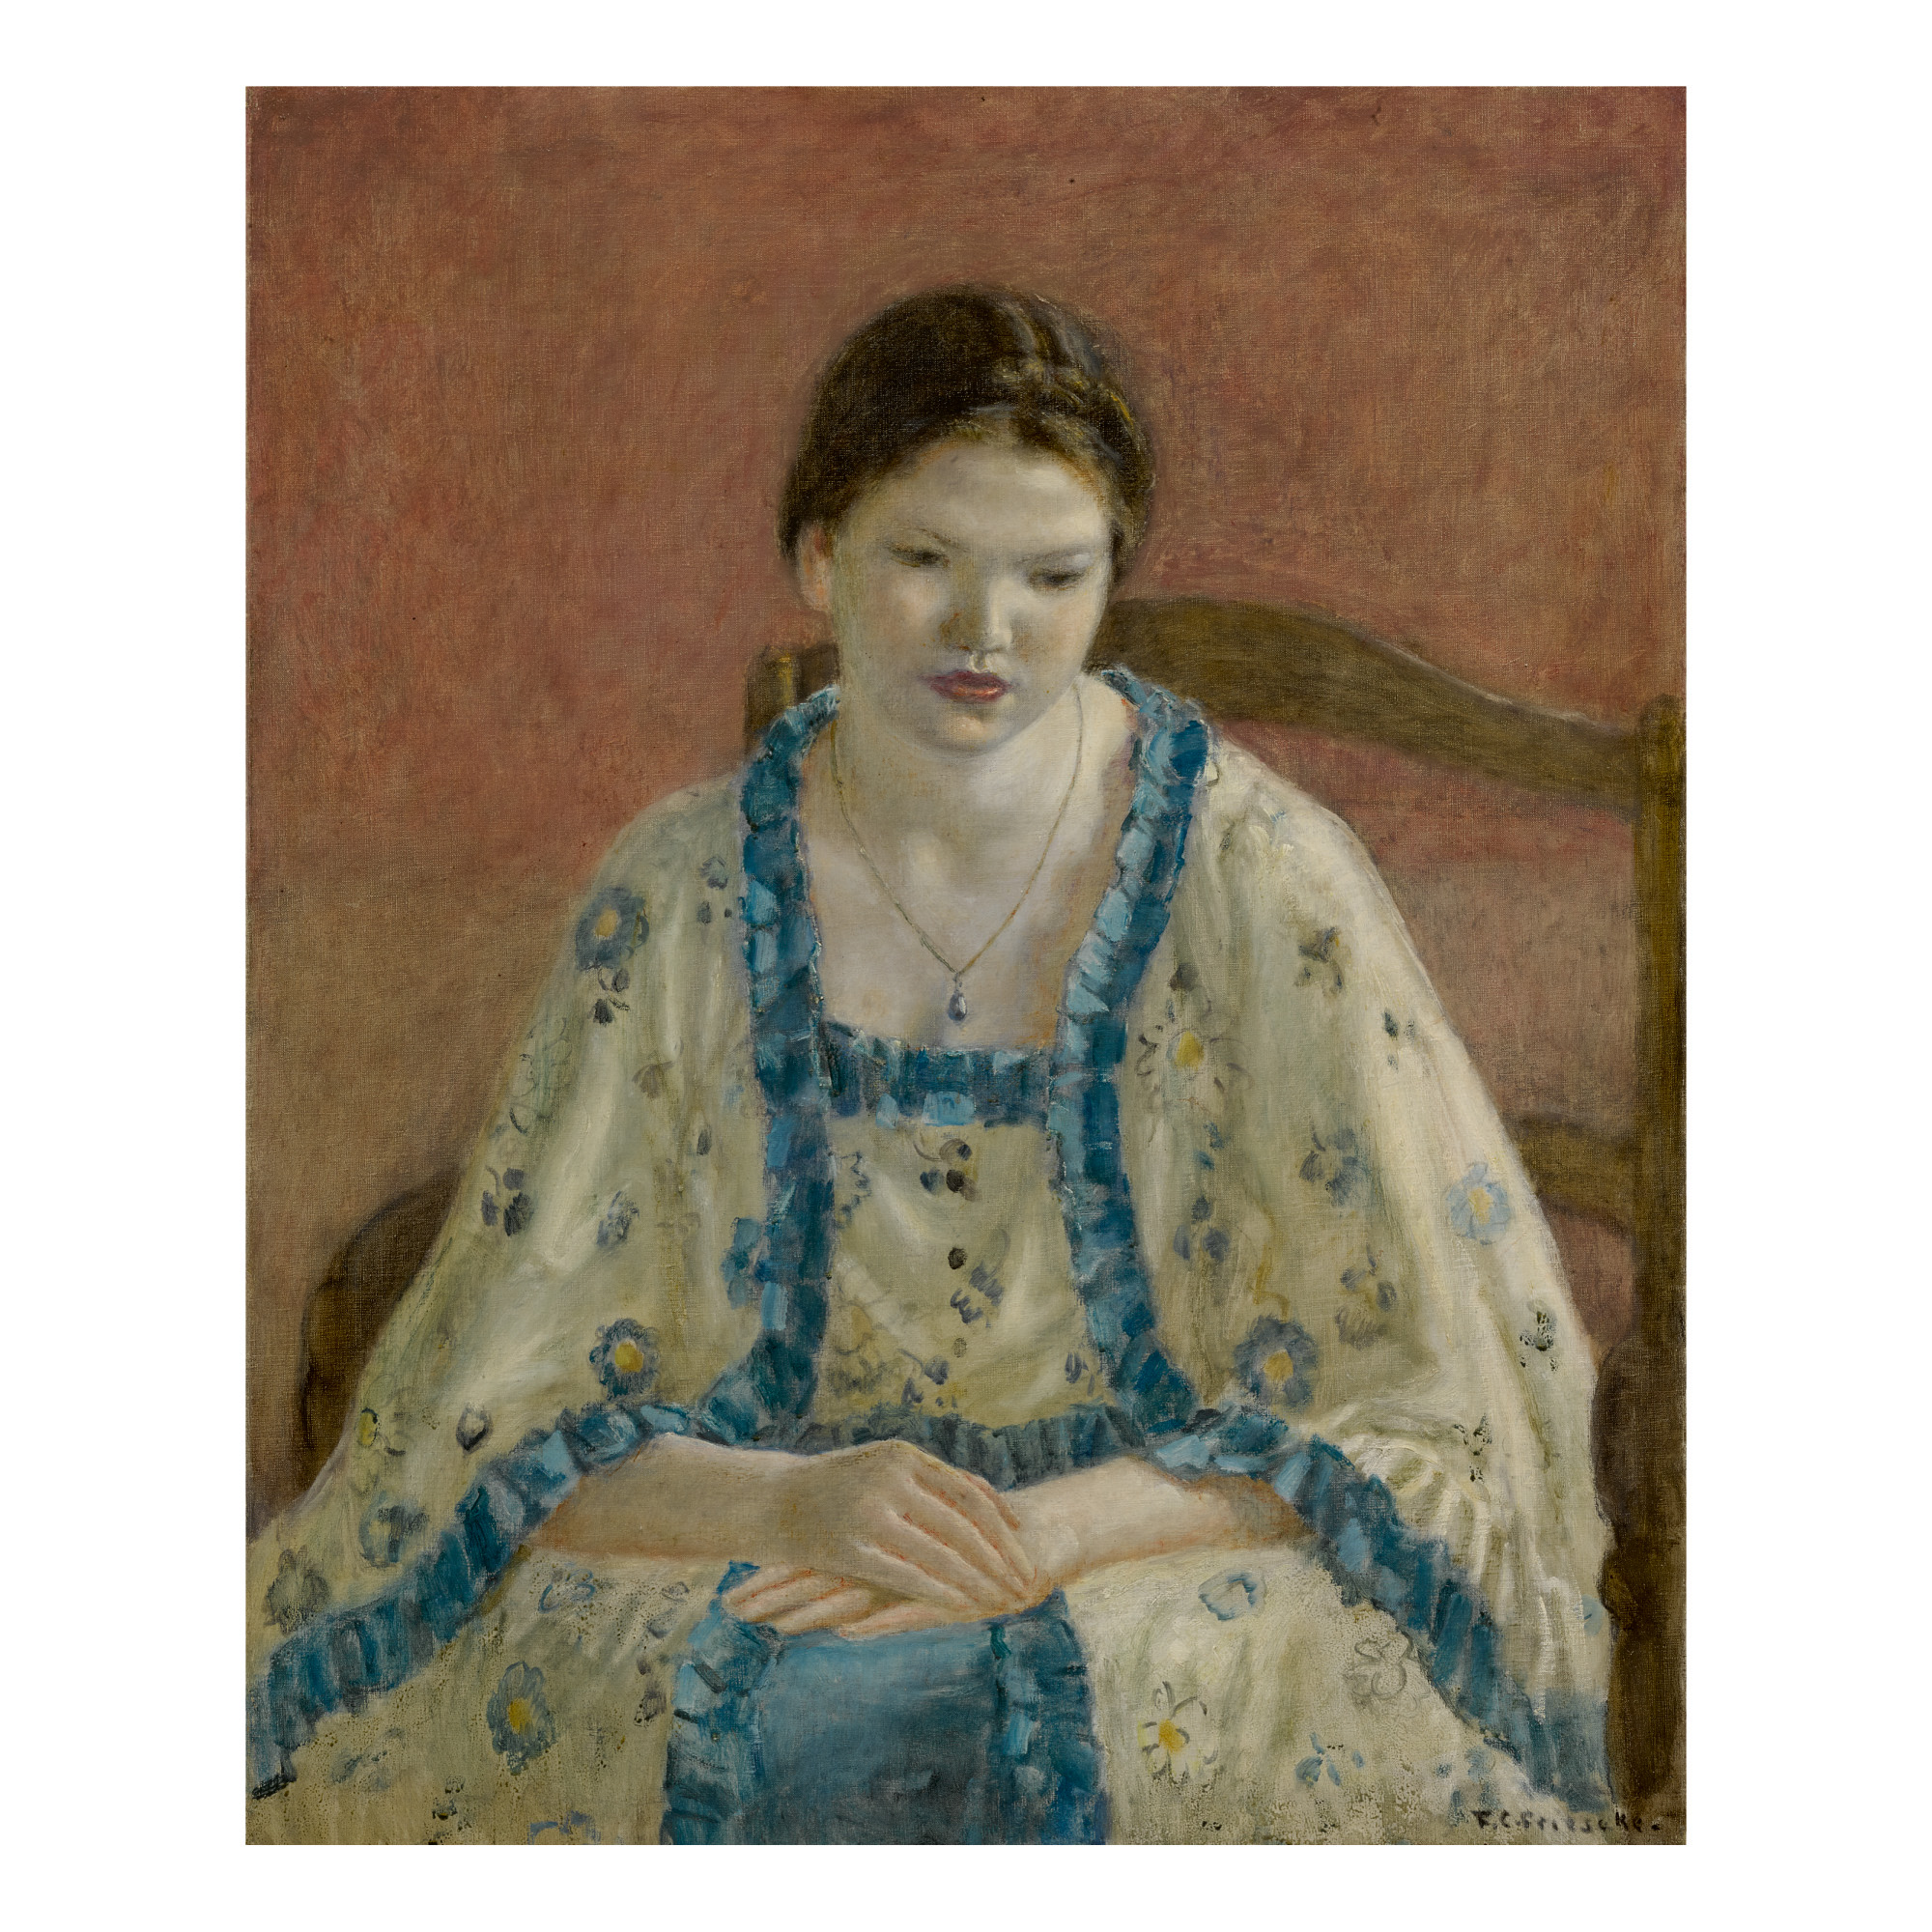 FREDERICK CARL FRIESEKE | PORTRAIT OF A GIRL IN LOUIS XV COSTUME